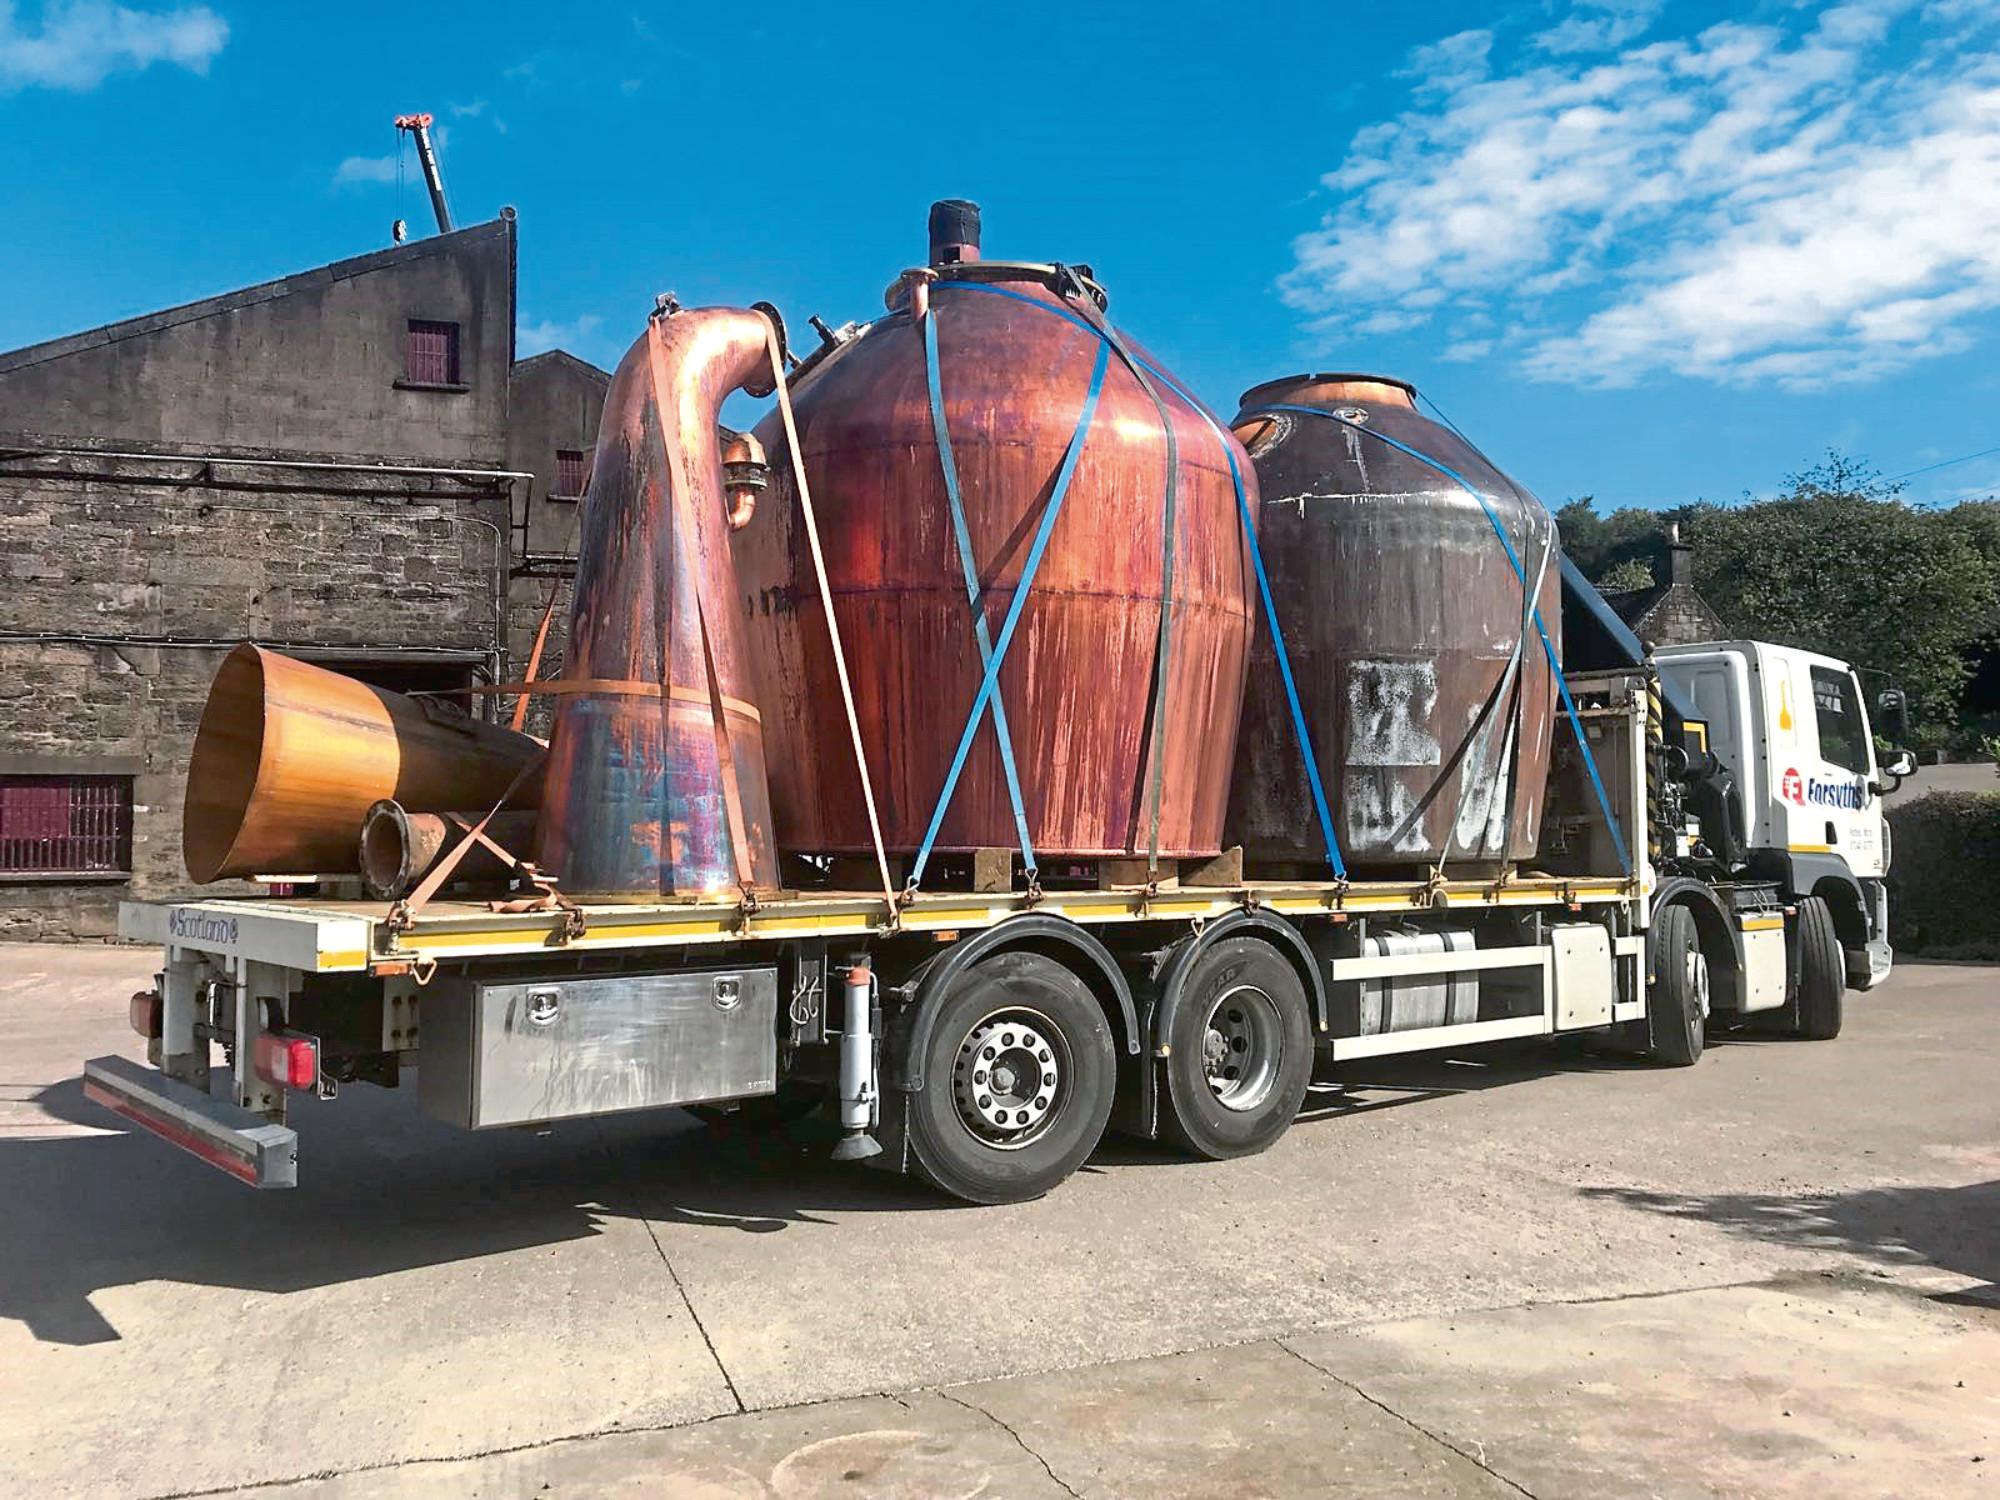 Glencadam Distillery takes delivery of a new still